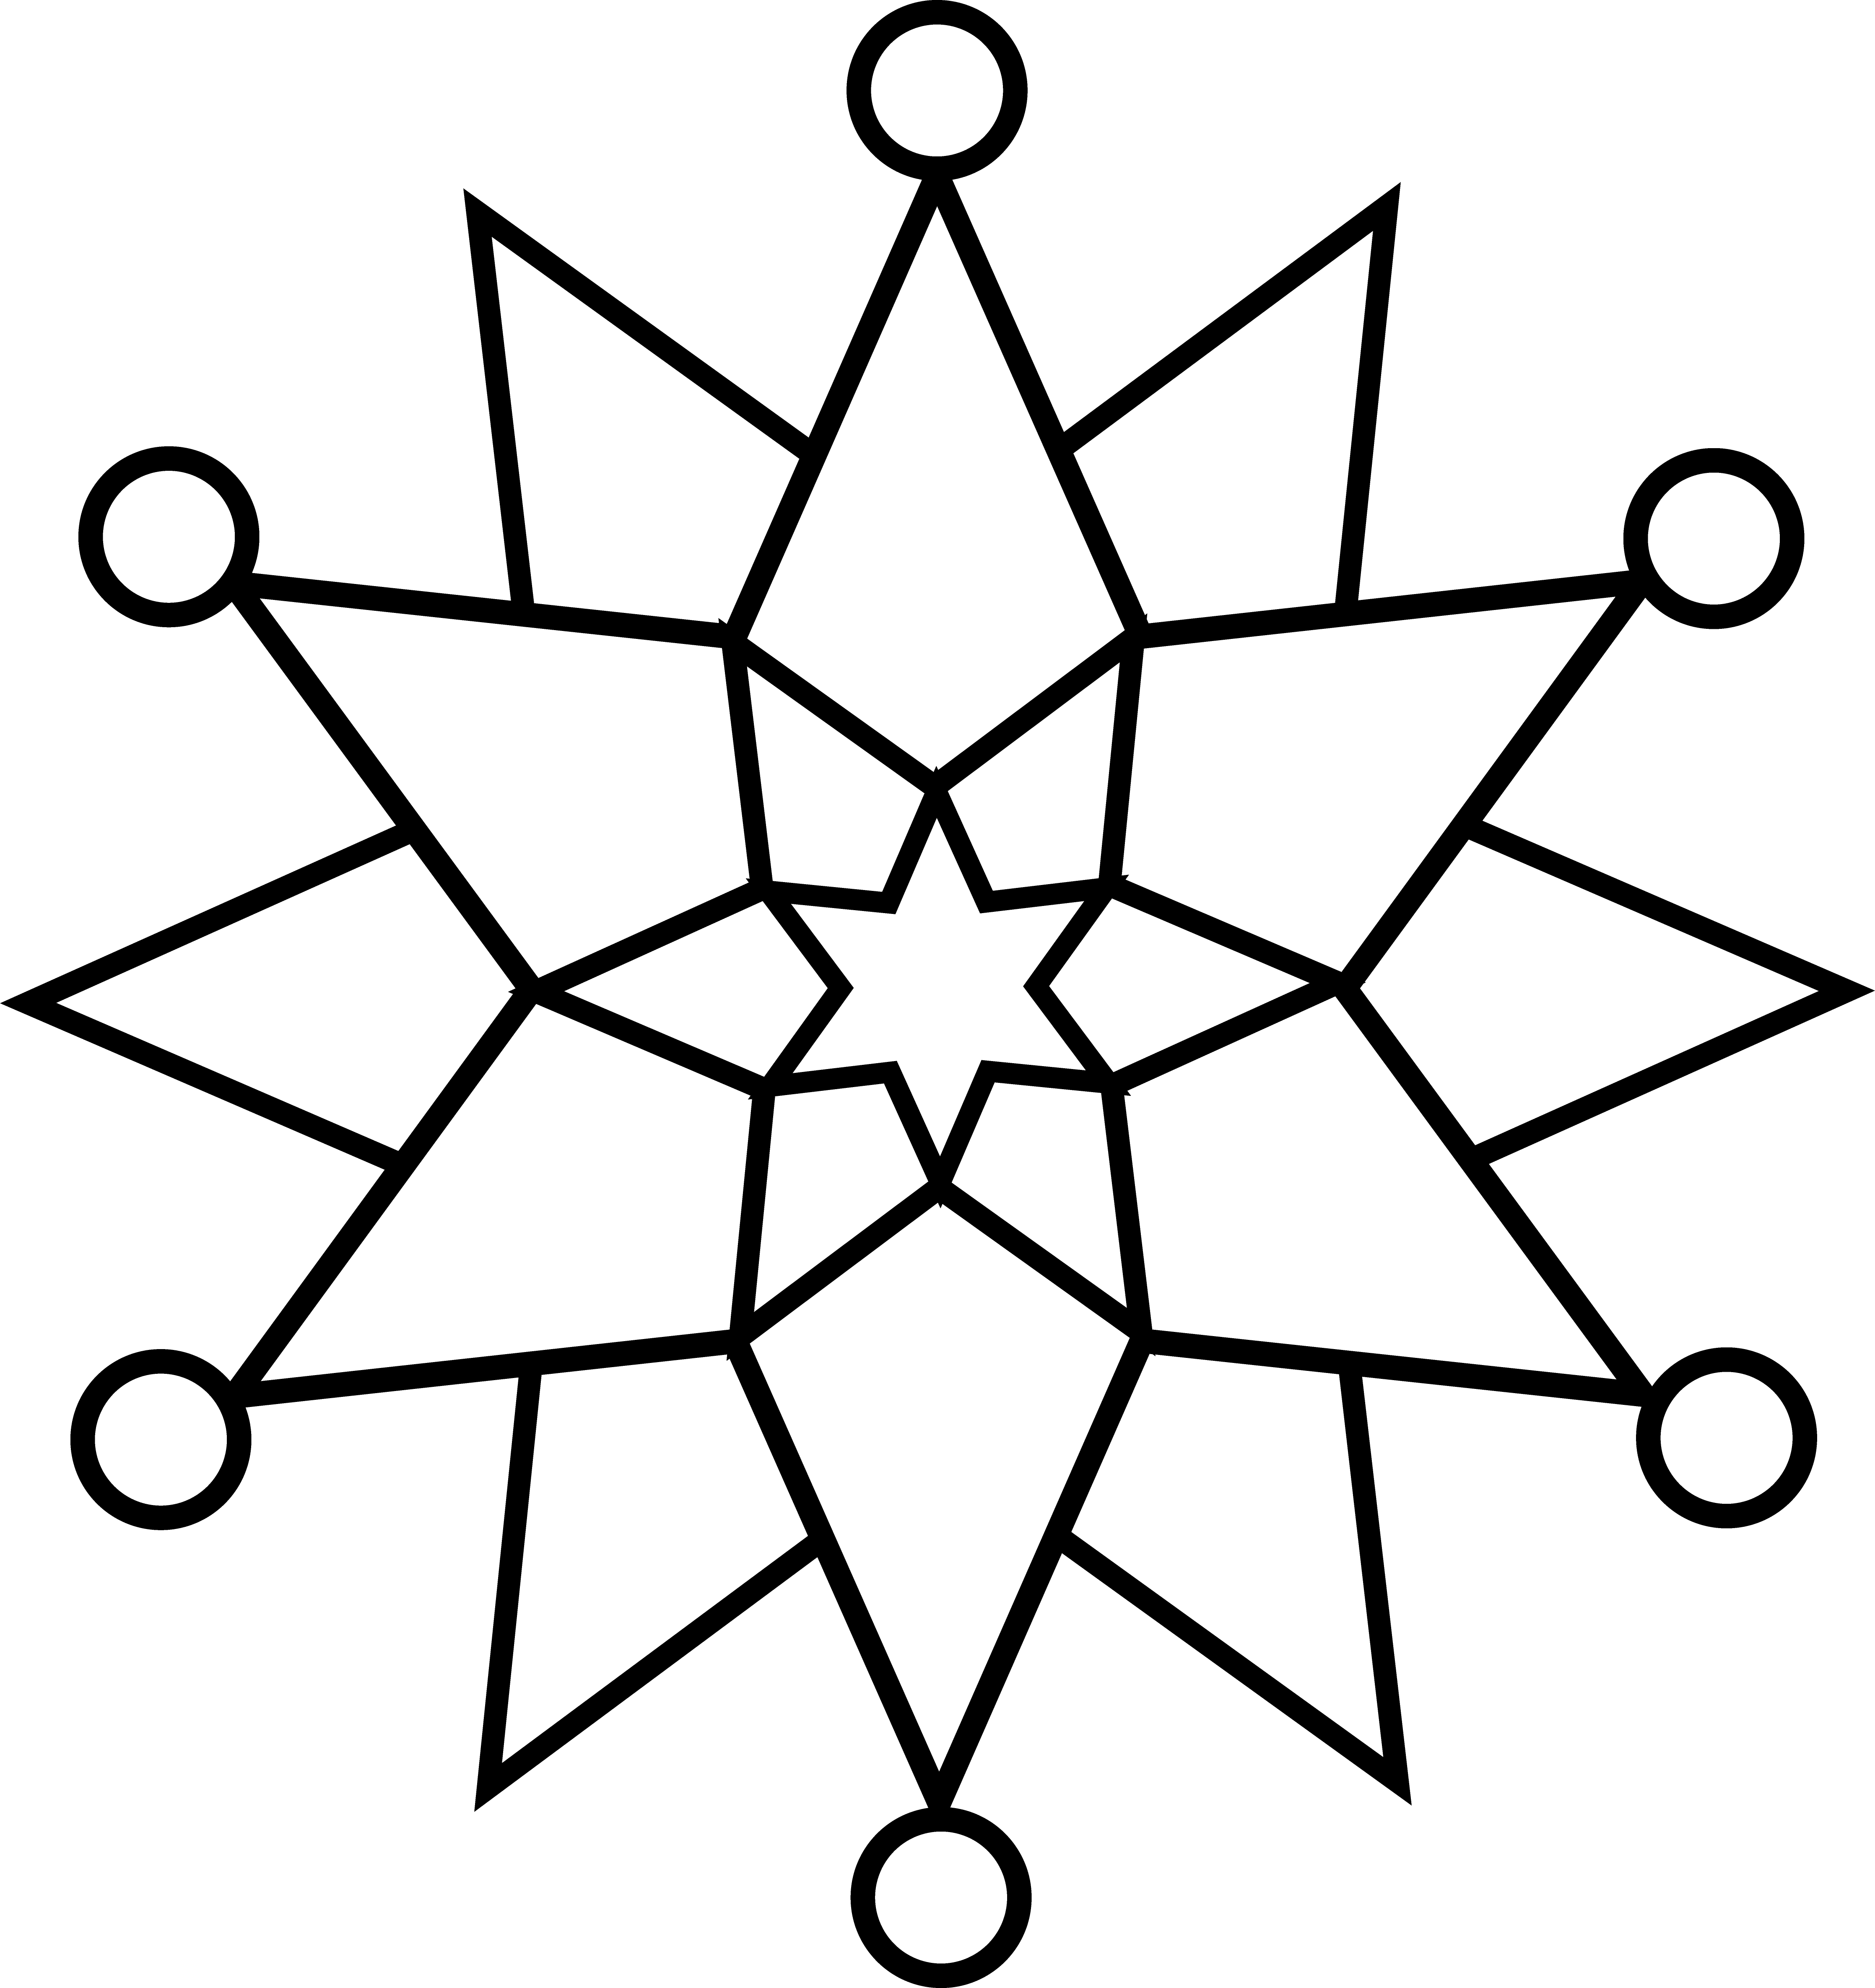 Black and White Snowflake | design | Pinterest | Snowflake pattern ...